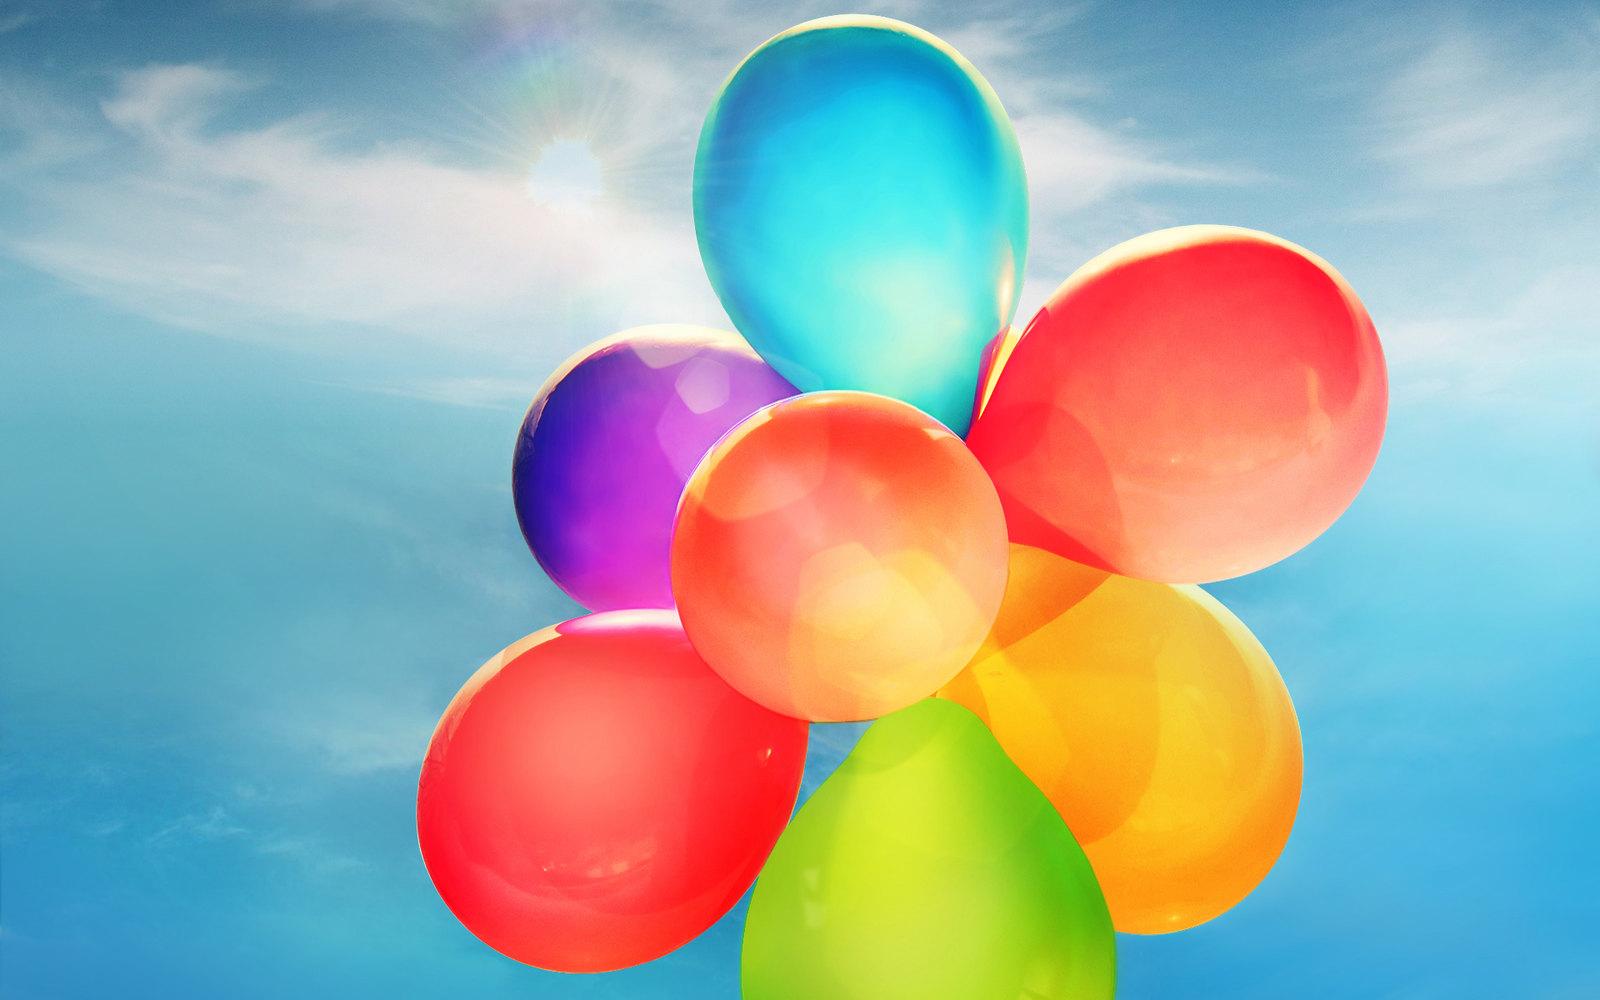 Balloon Wallpaper HD Download